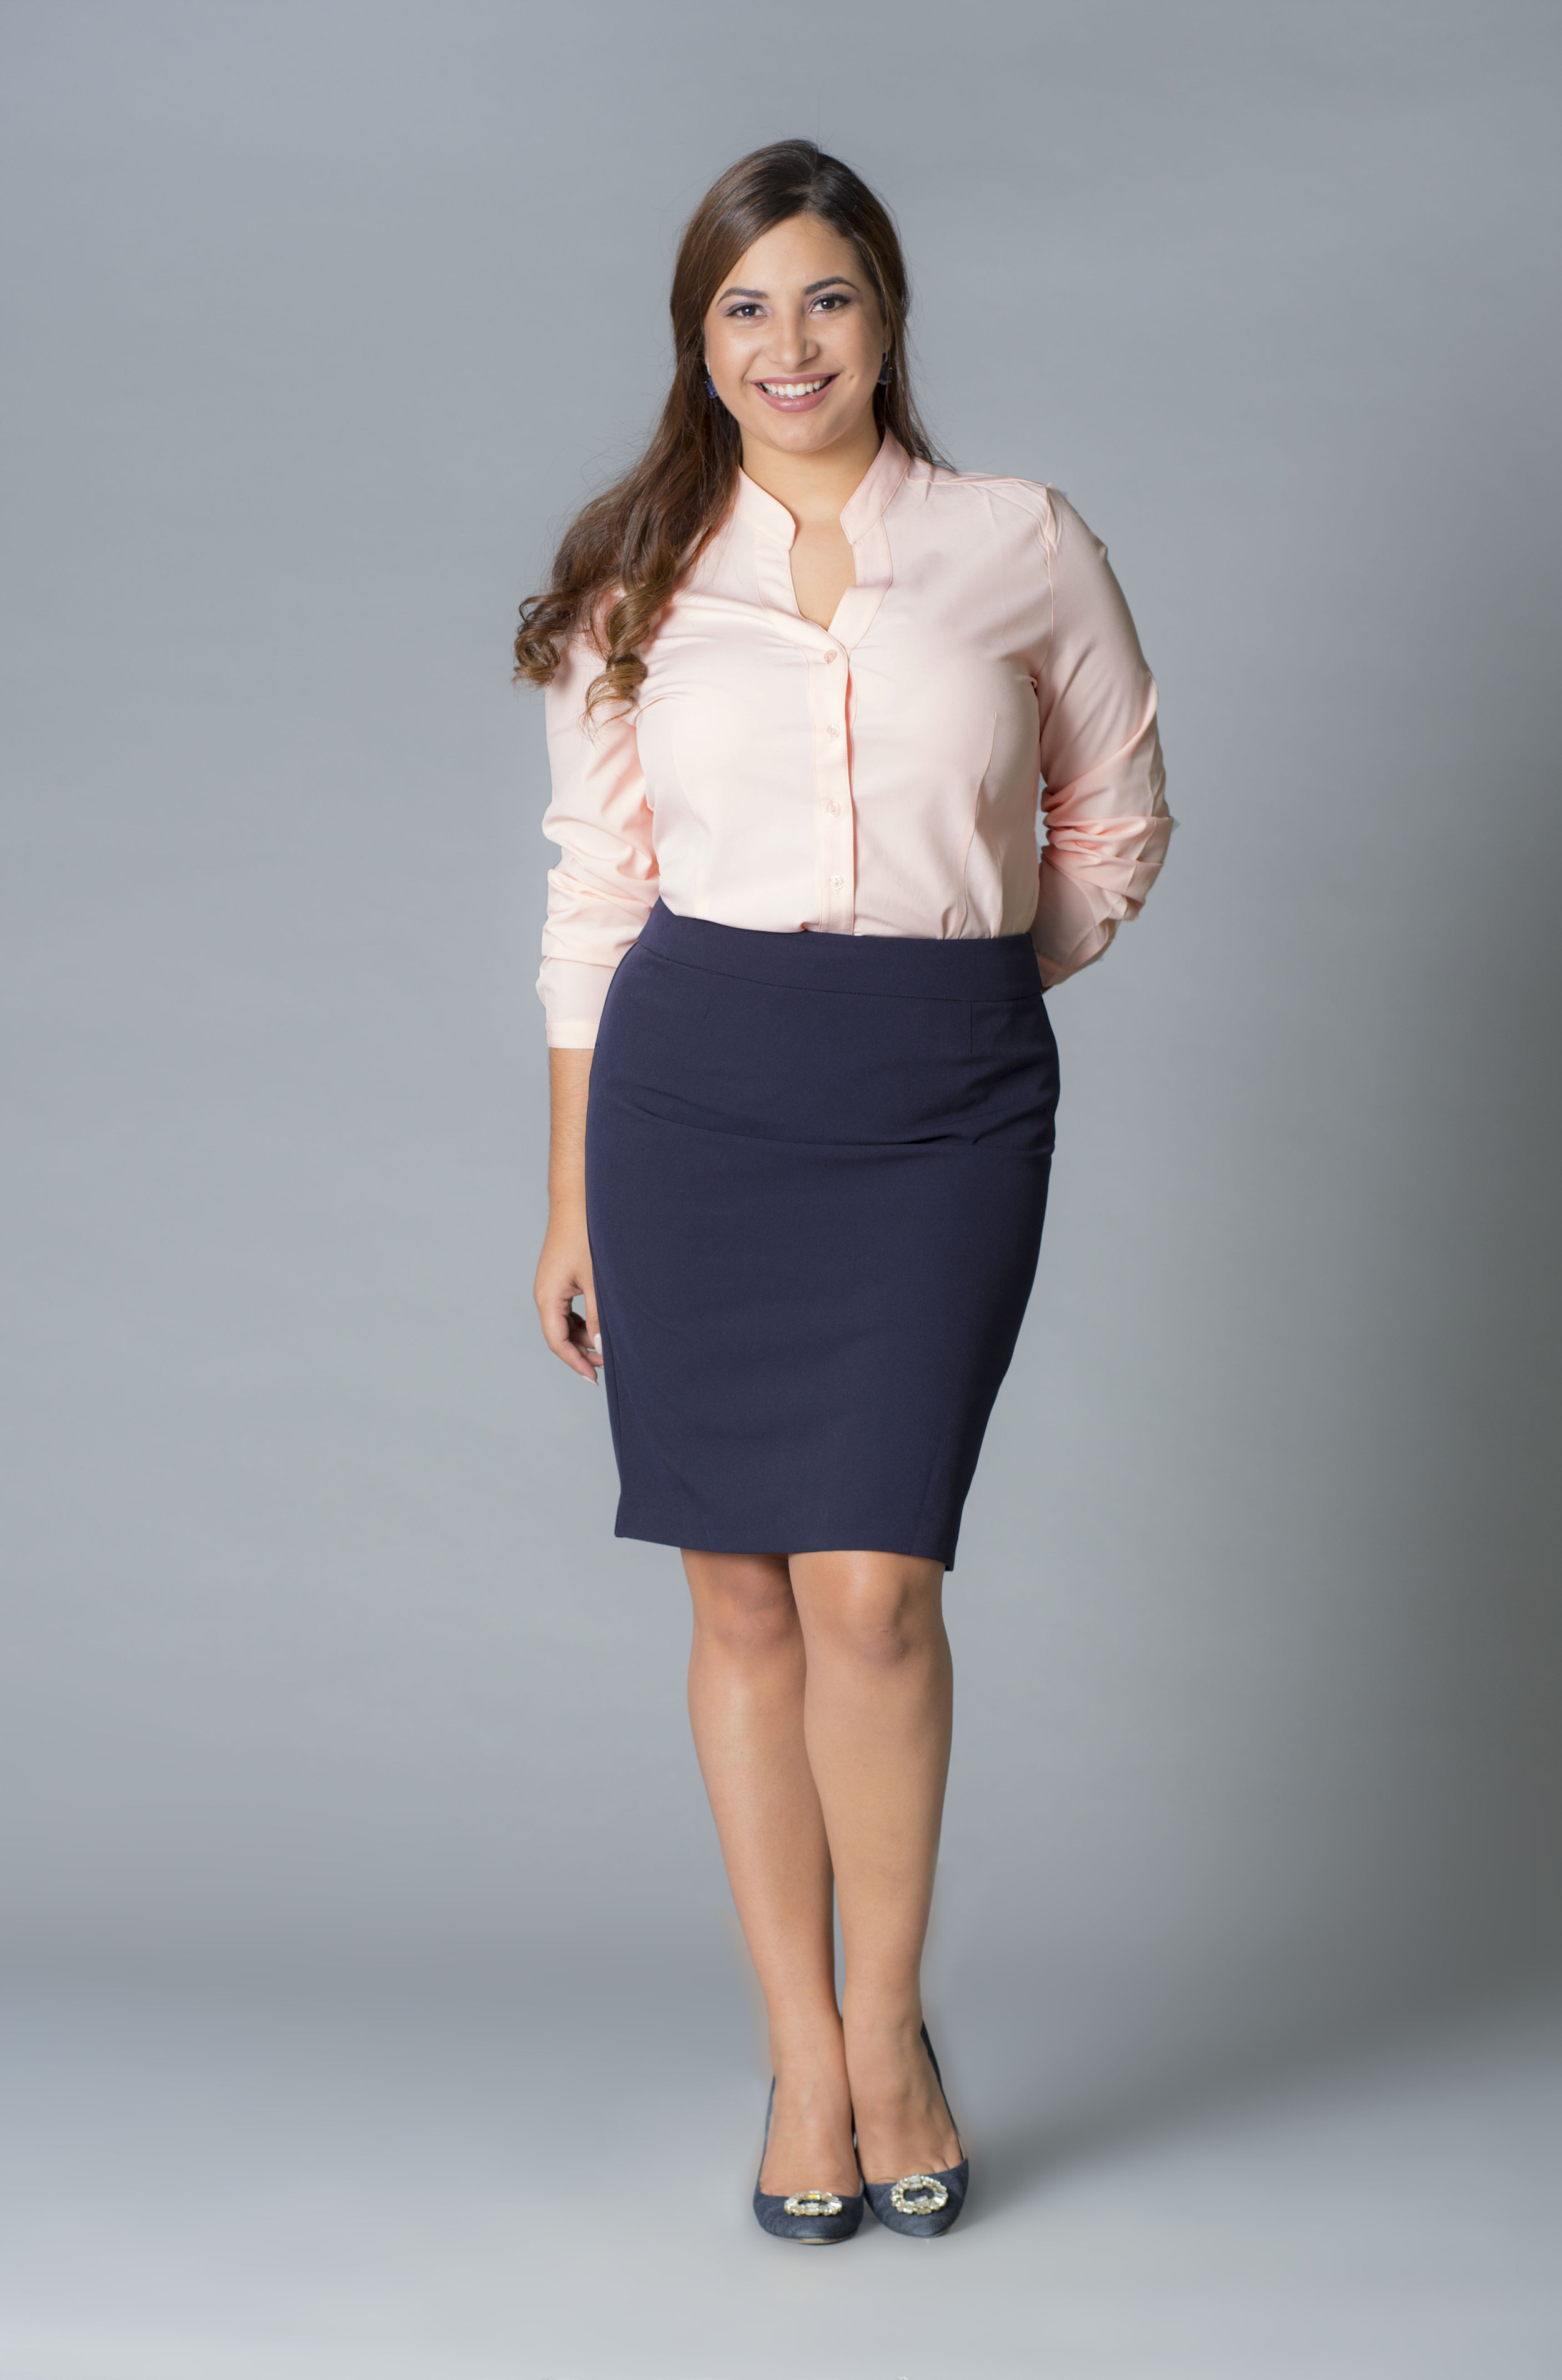 JCLN 446 rosa - falda azul copy.jpg